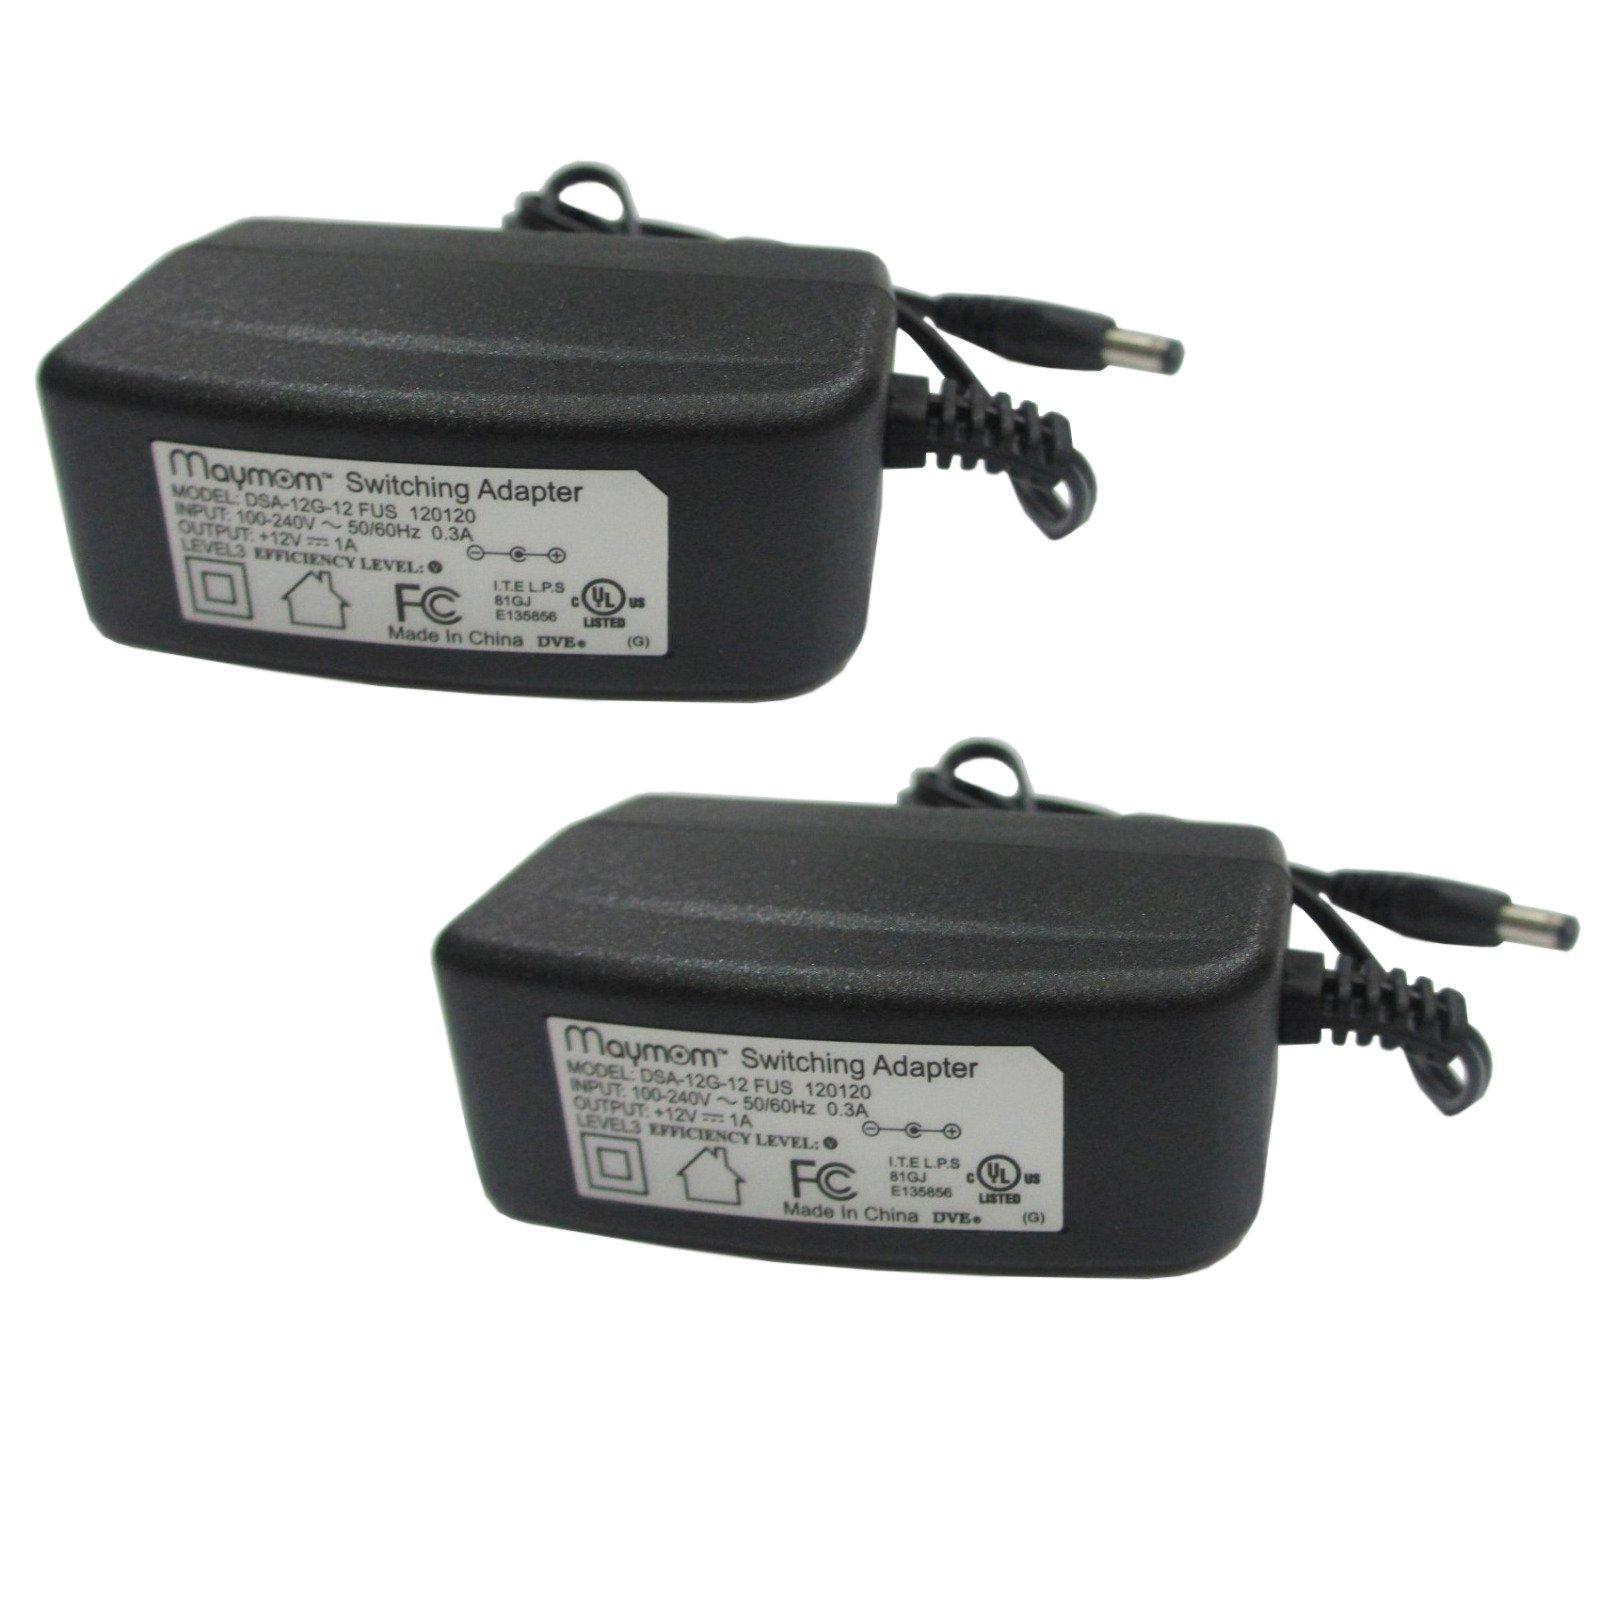 Maymom Powersupply AC Adapter For Medela 12V Electric Breastpumps, Set of 2